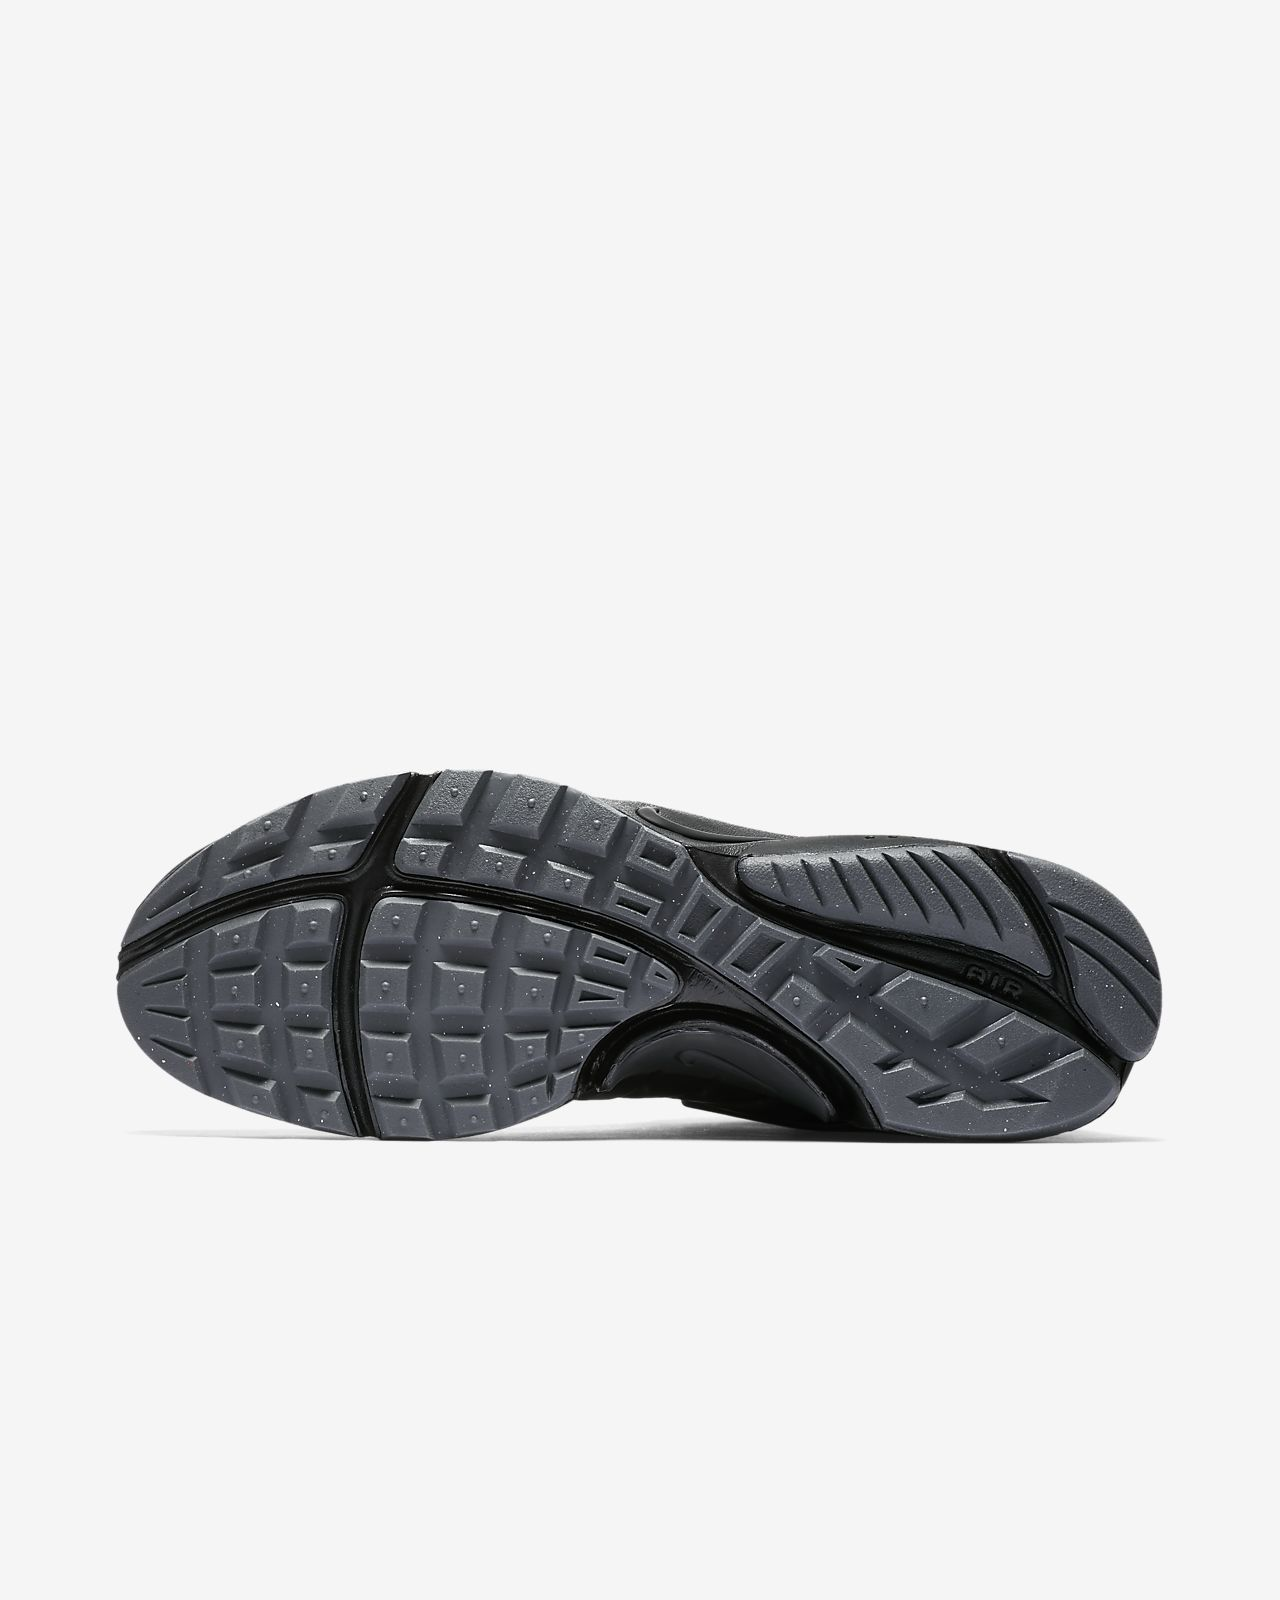 scarpe nike goretex uomo